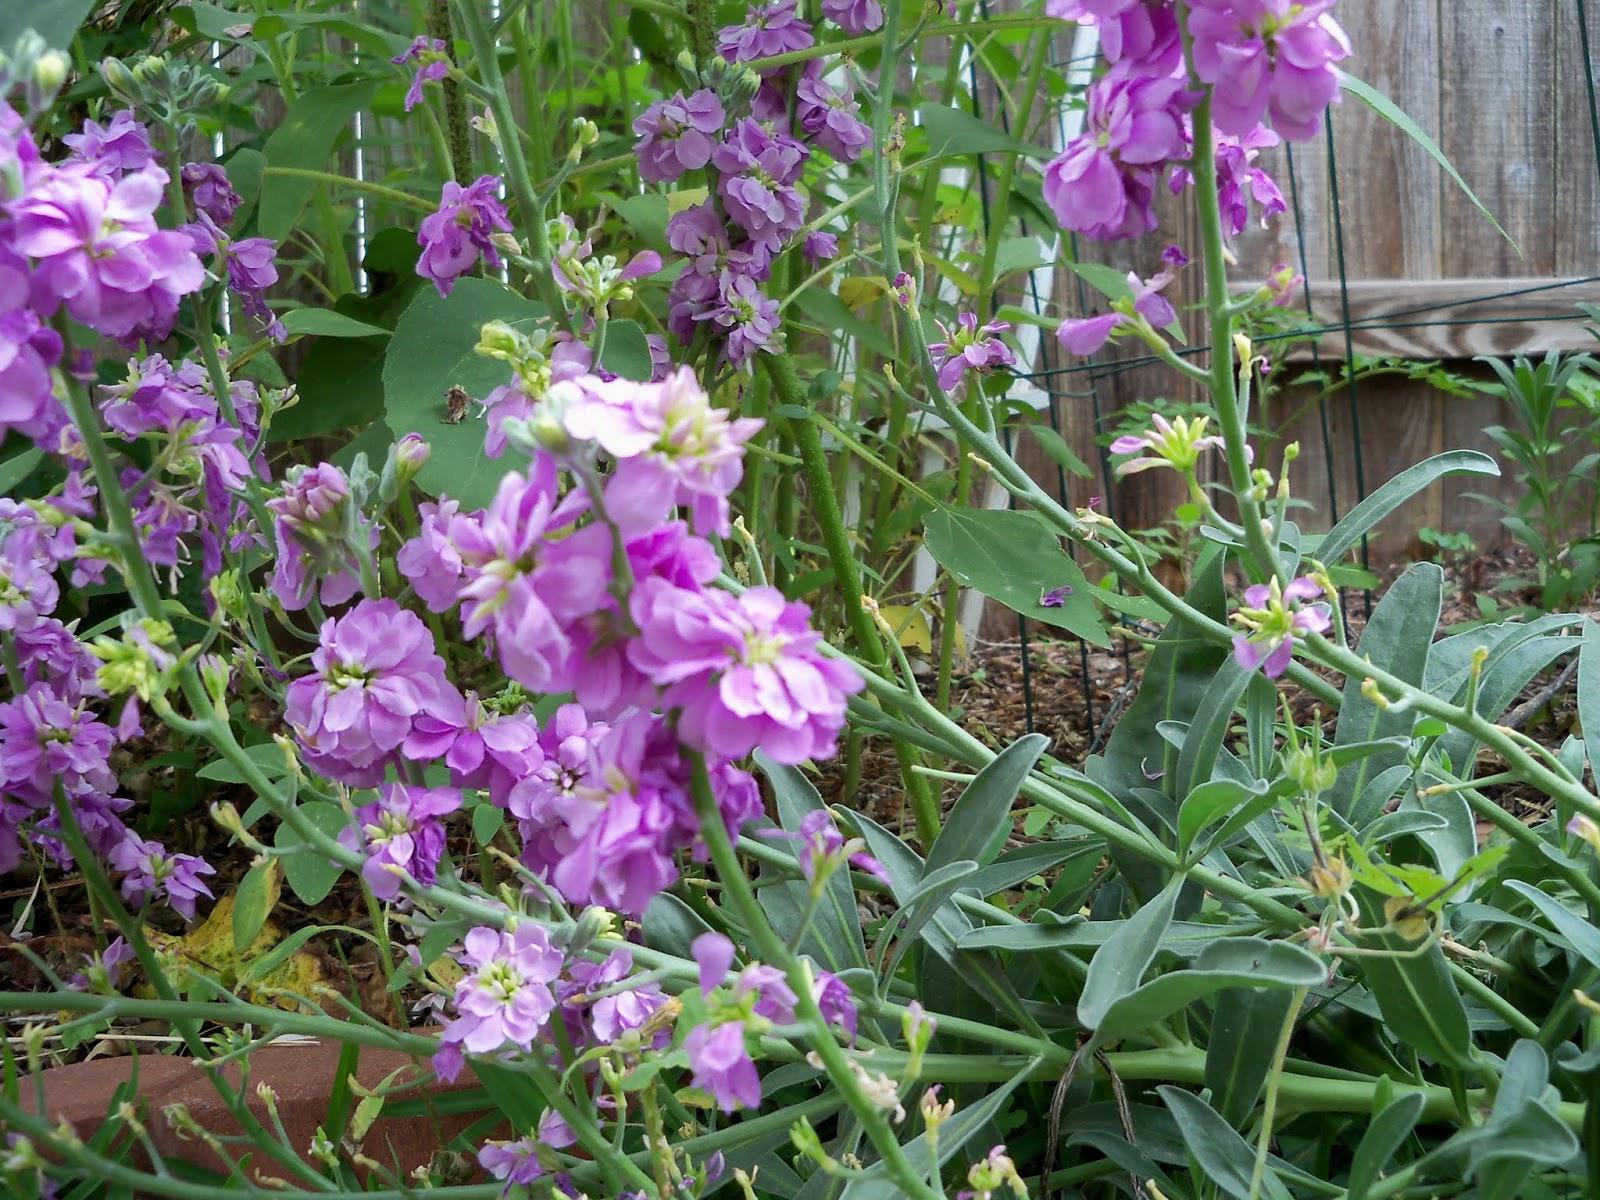 Gardening 2013 - 115_6032.JPG